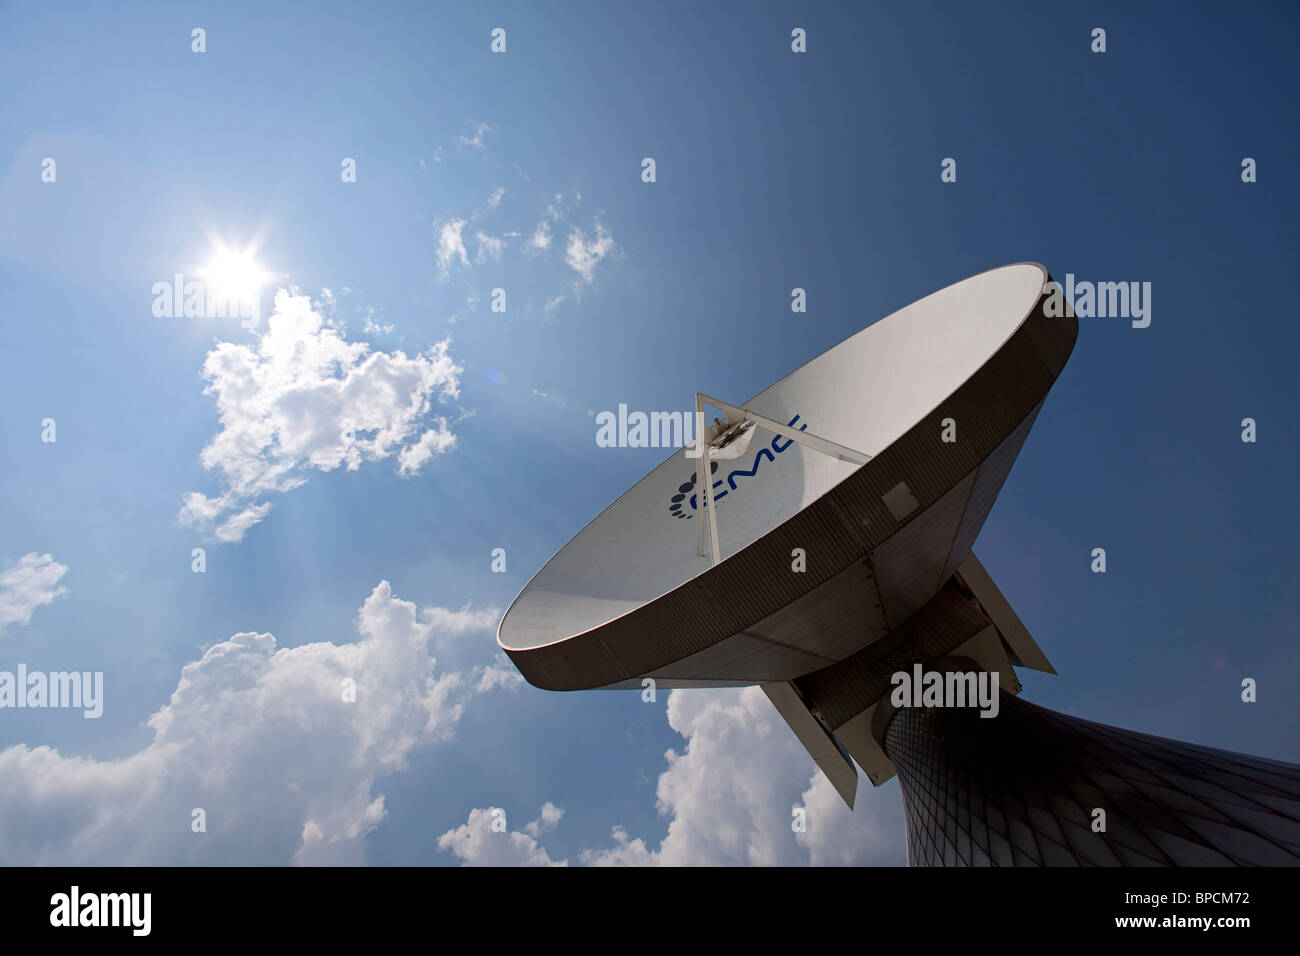 Teleport Stock Photos & Teleport Stock Images - Alamy